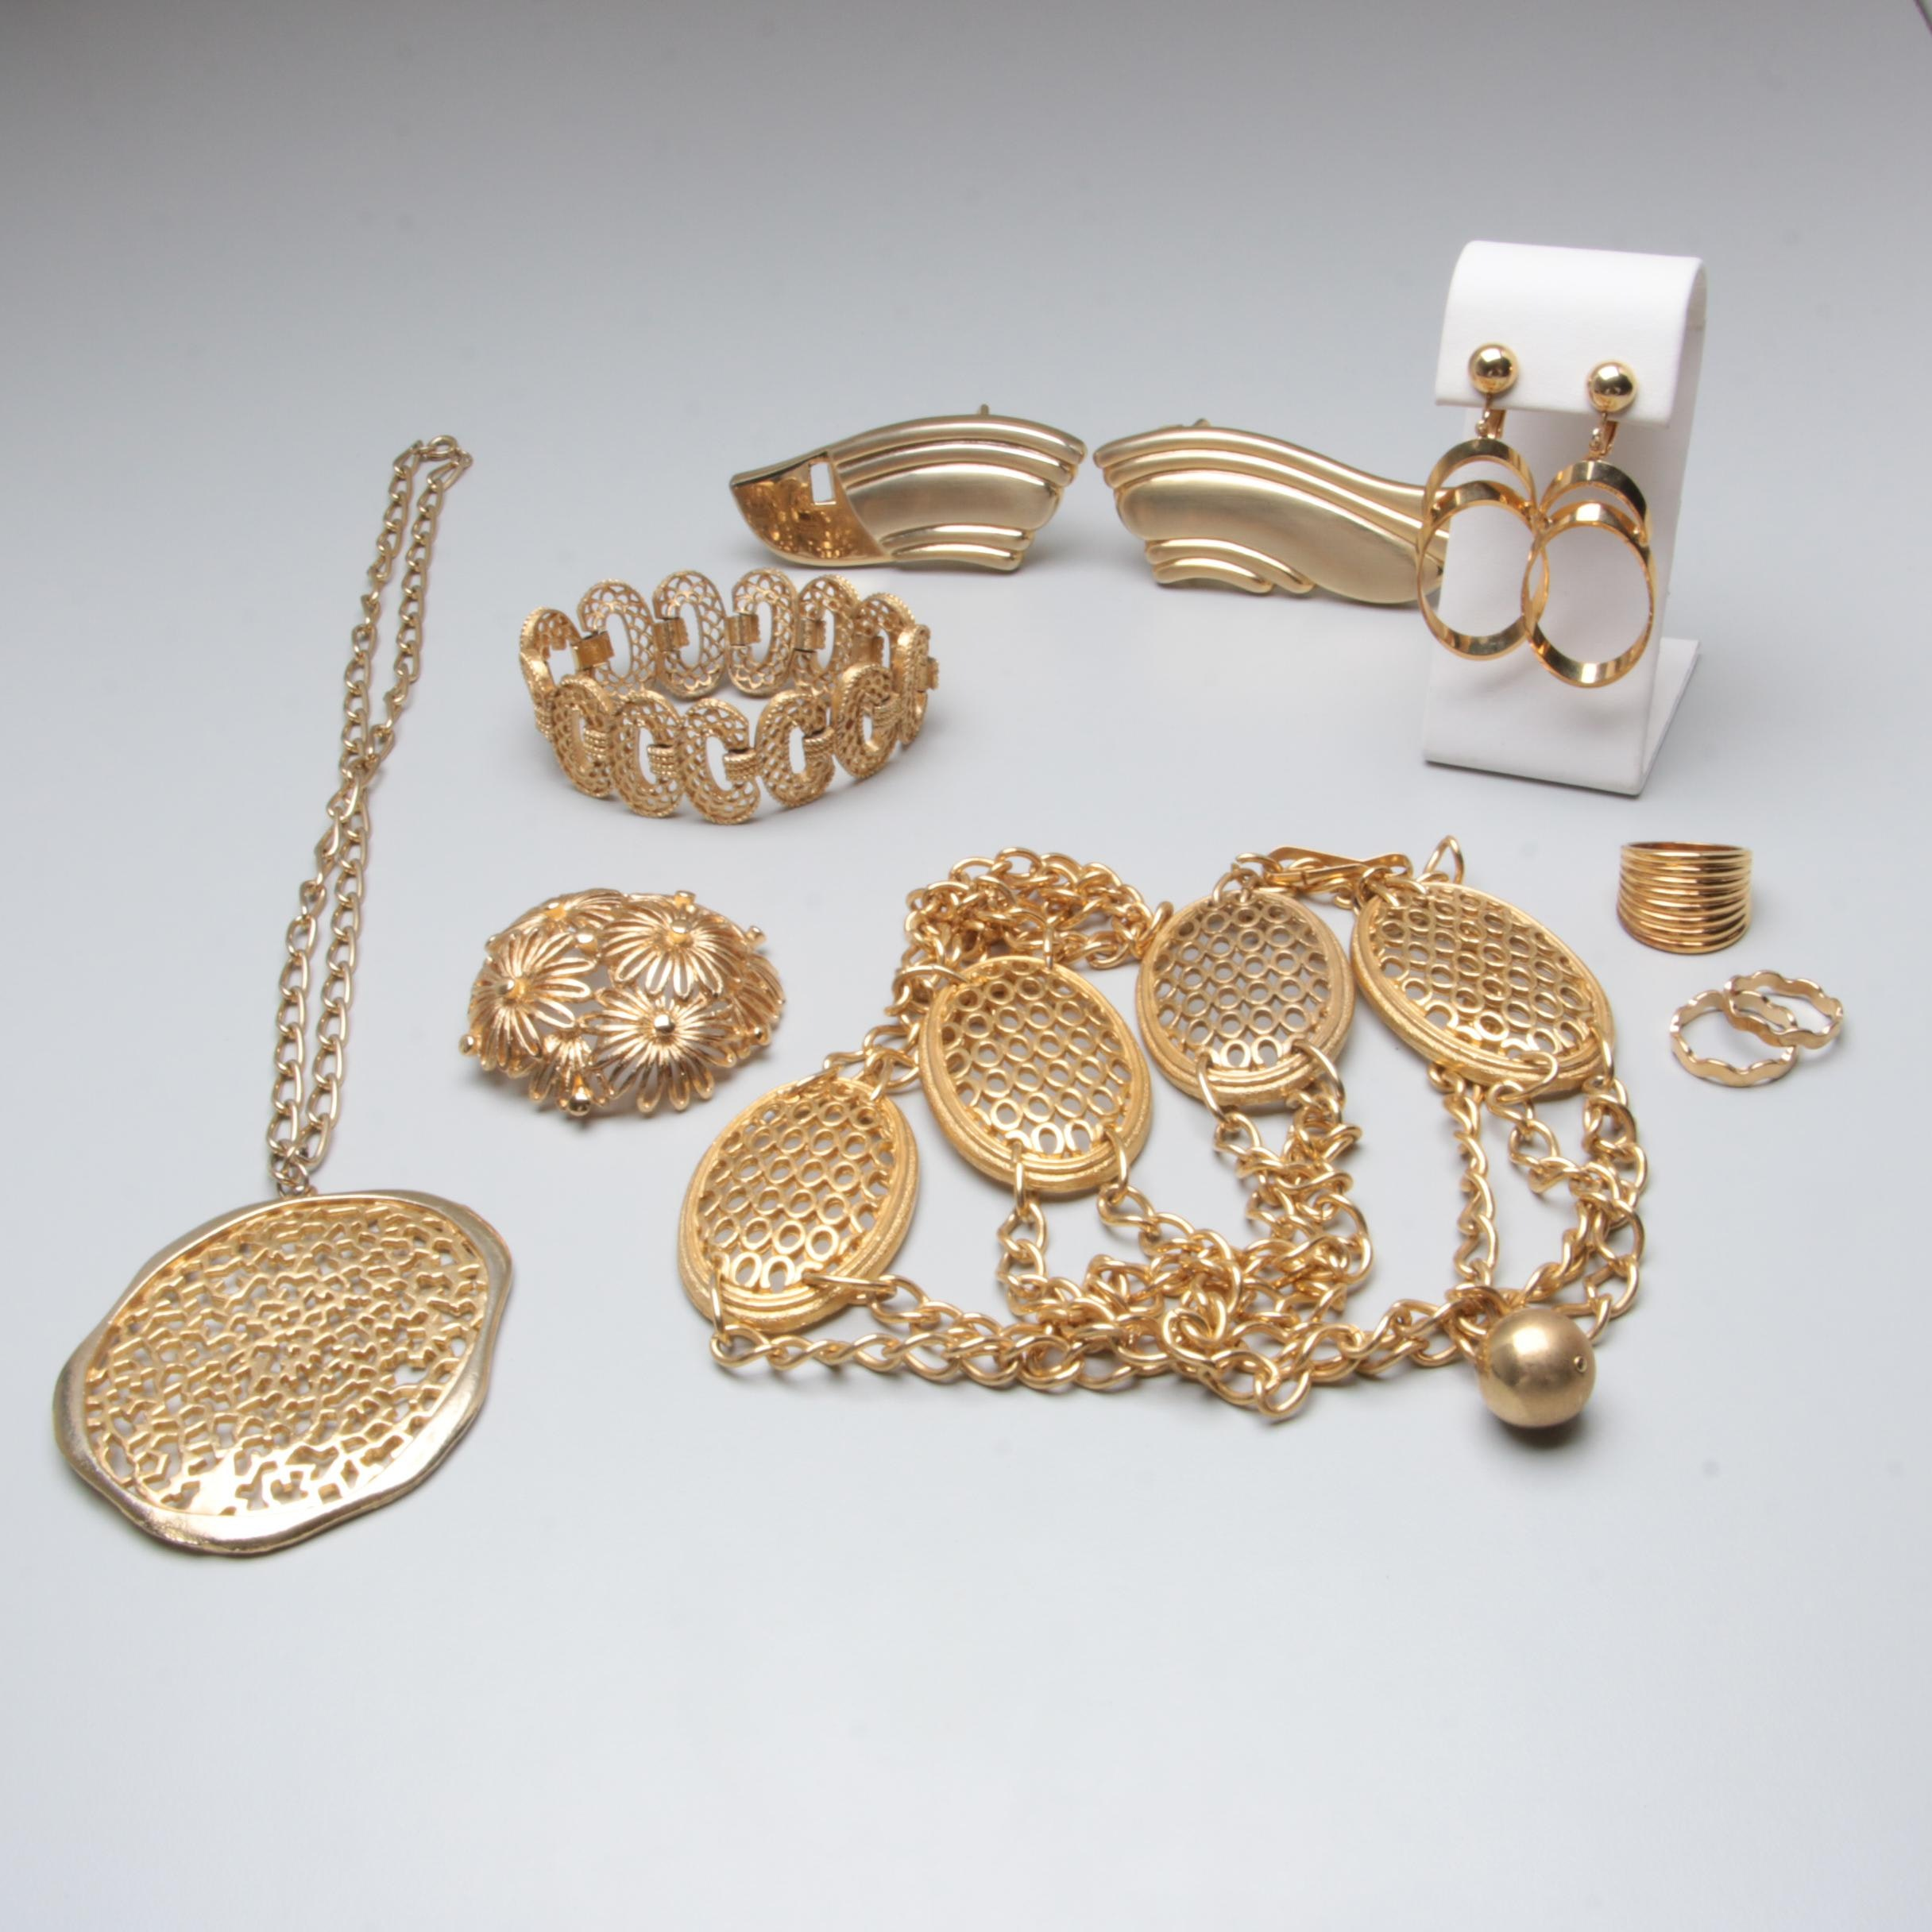 Gold Tone Jewelry Assortment Including Monet, Trifari and Milor